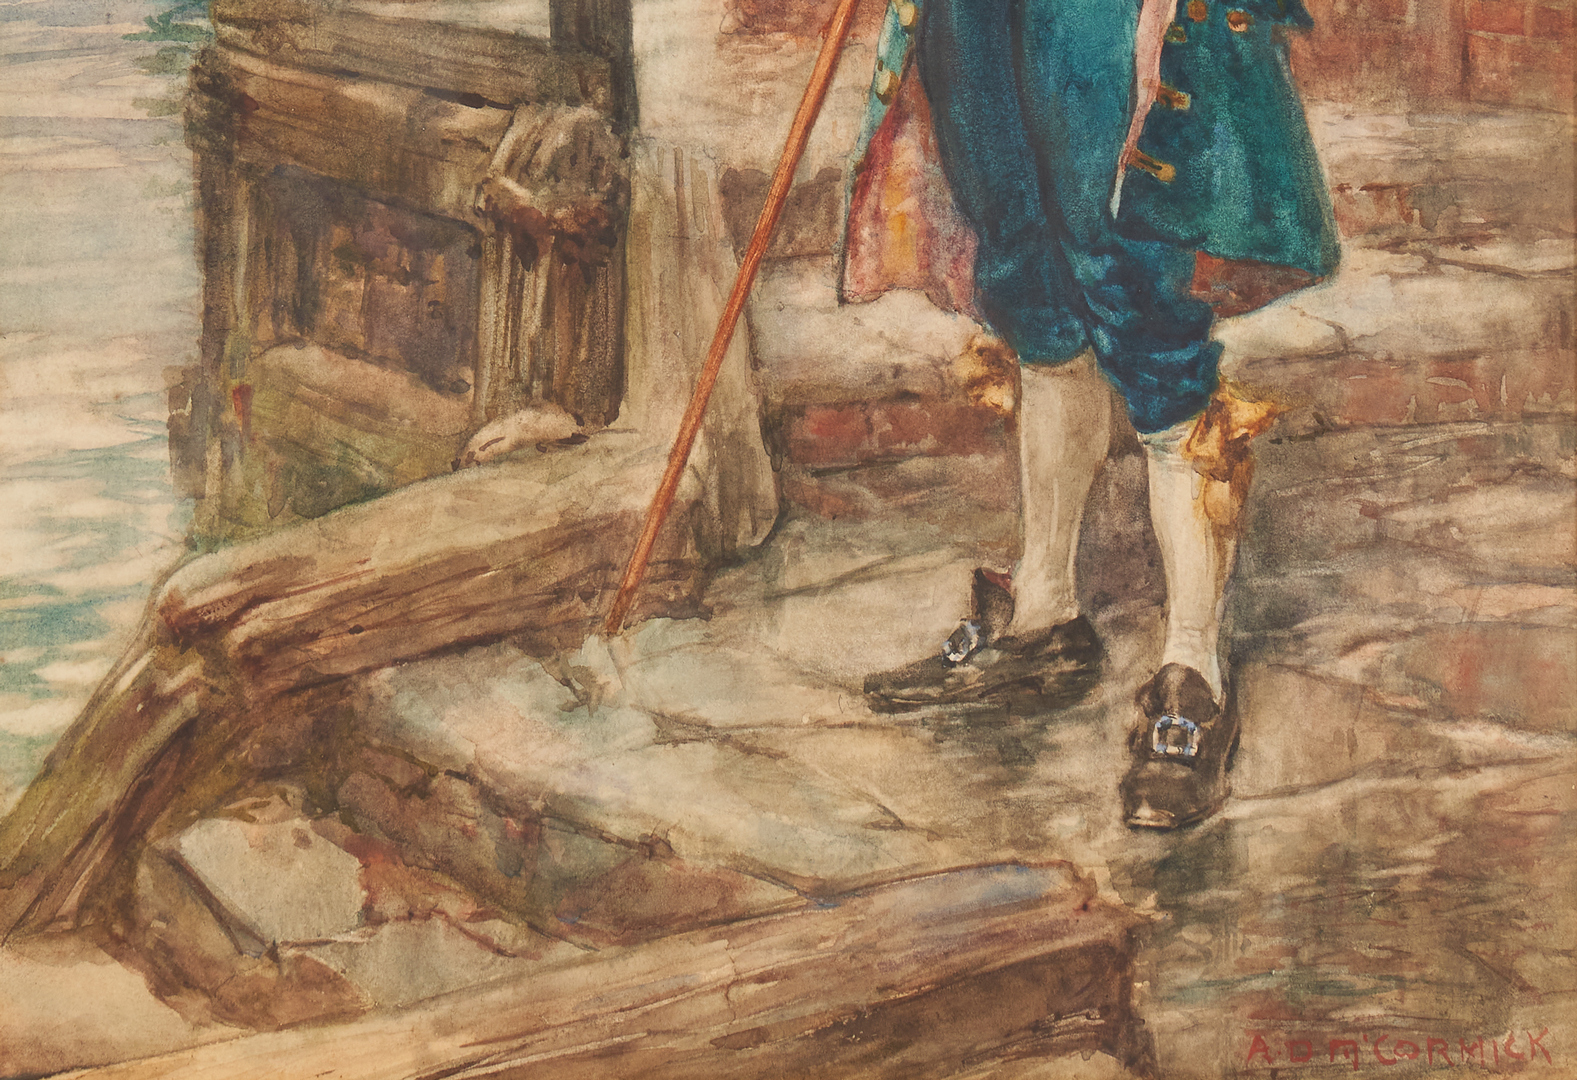 Lot 394: A.D. McCormick and A. Varley, 3 Watercolors